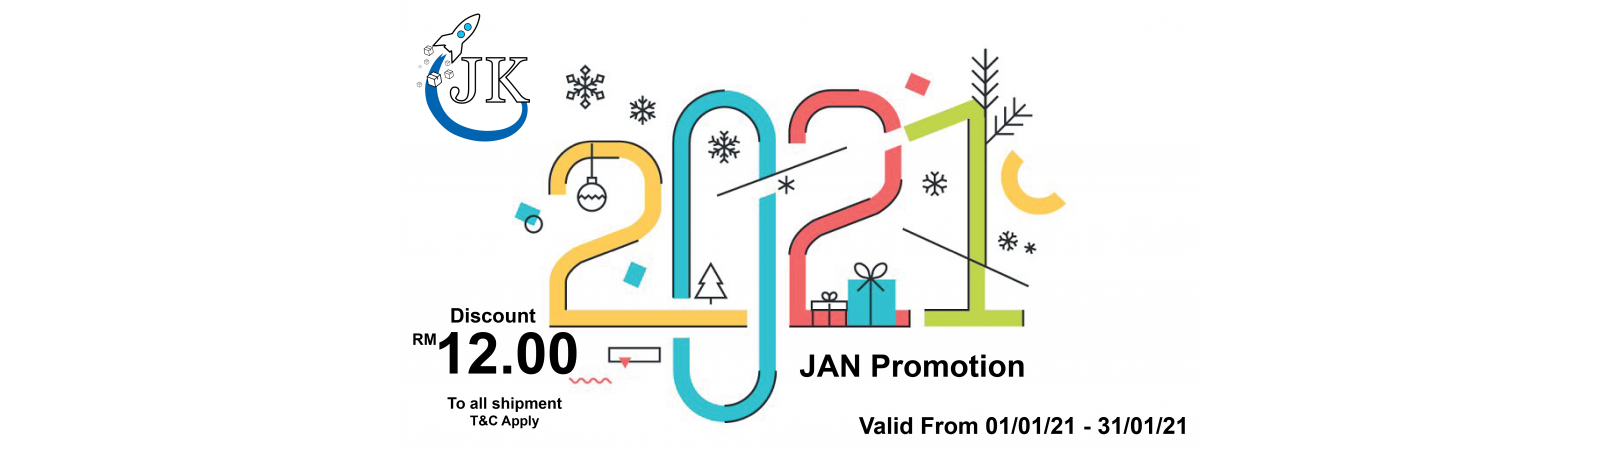 Jan Promotion 2021